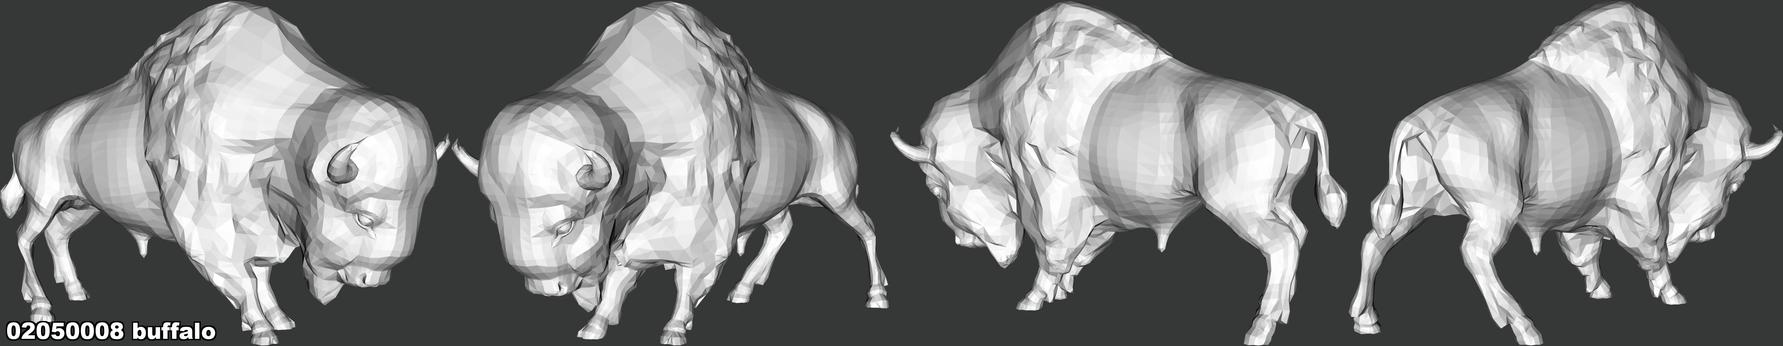 02050008 buffalo.png